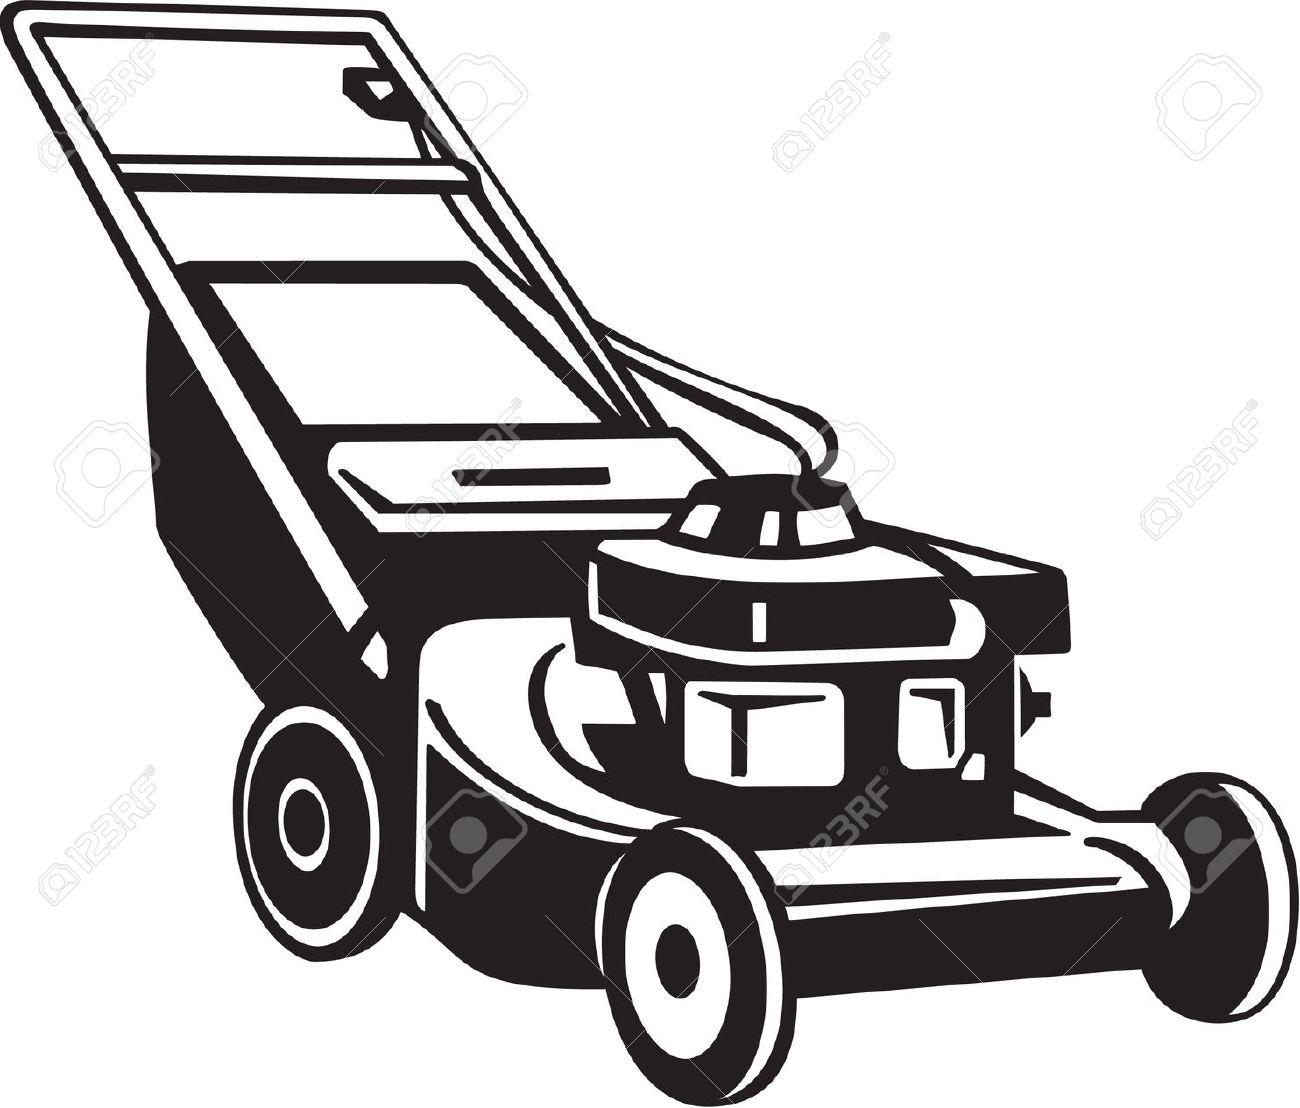 Lawn Mower: Power Lawnmower .-lawn mower: Power Lawnmower .-16